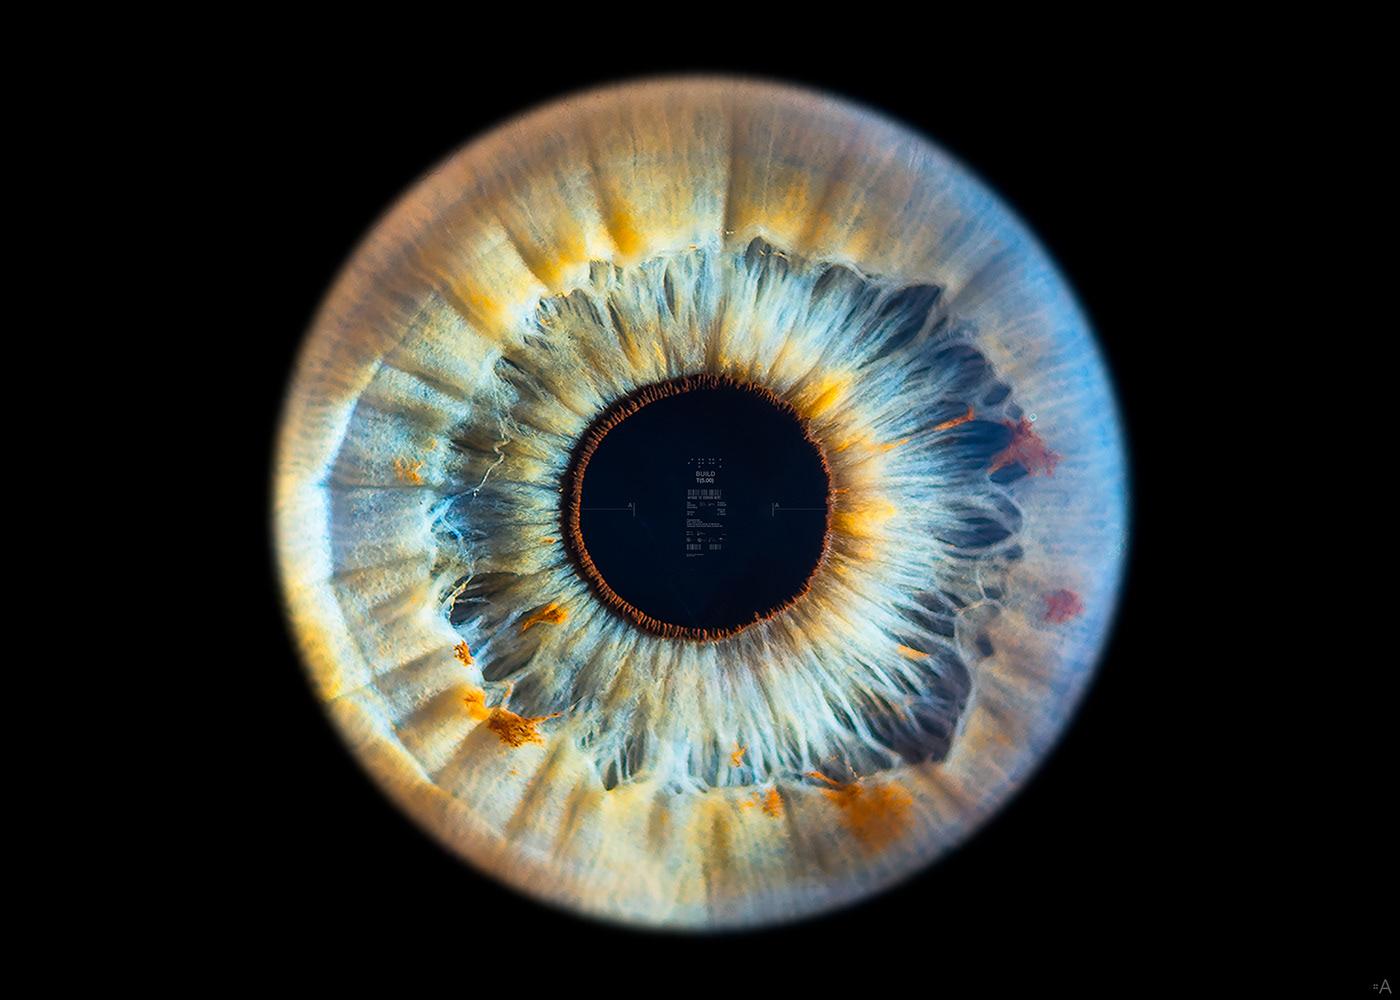 Pin On Eyeballs